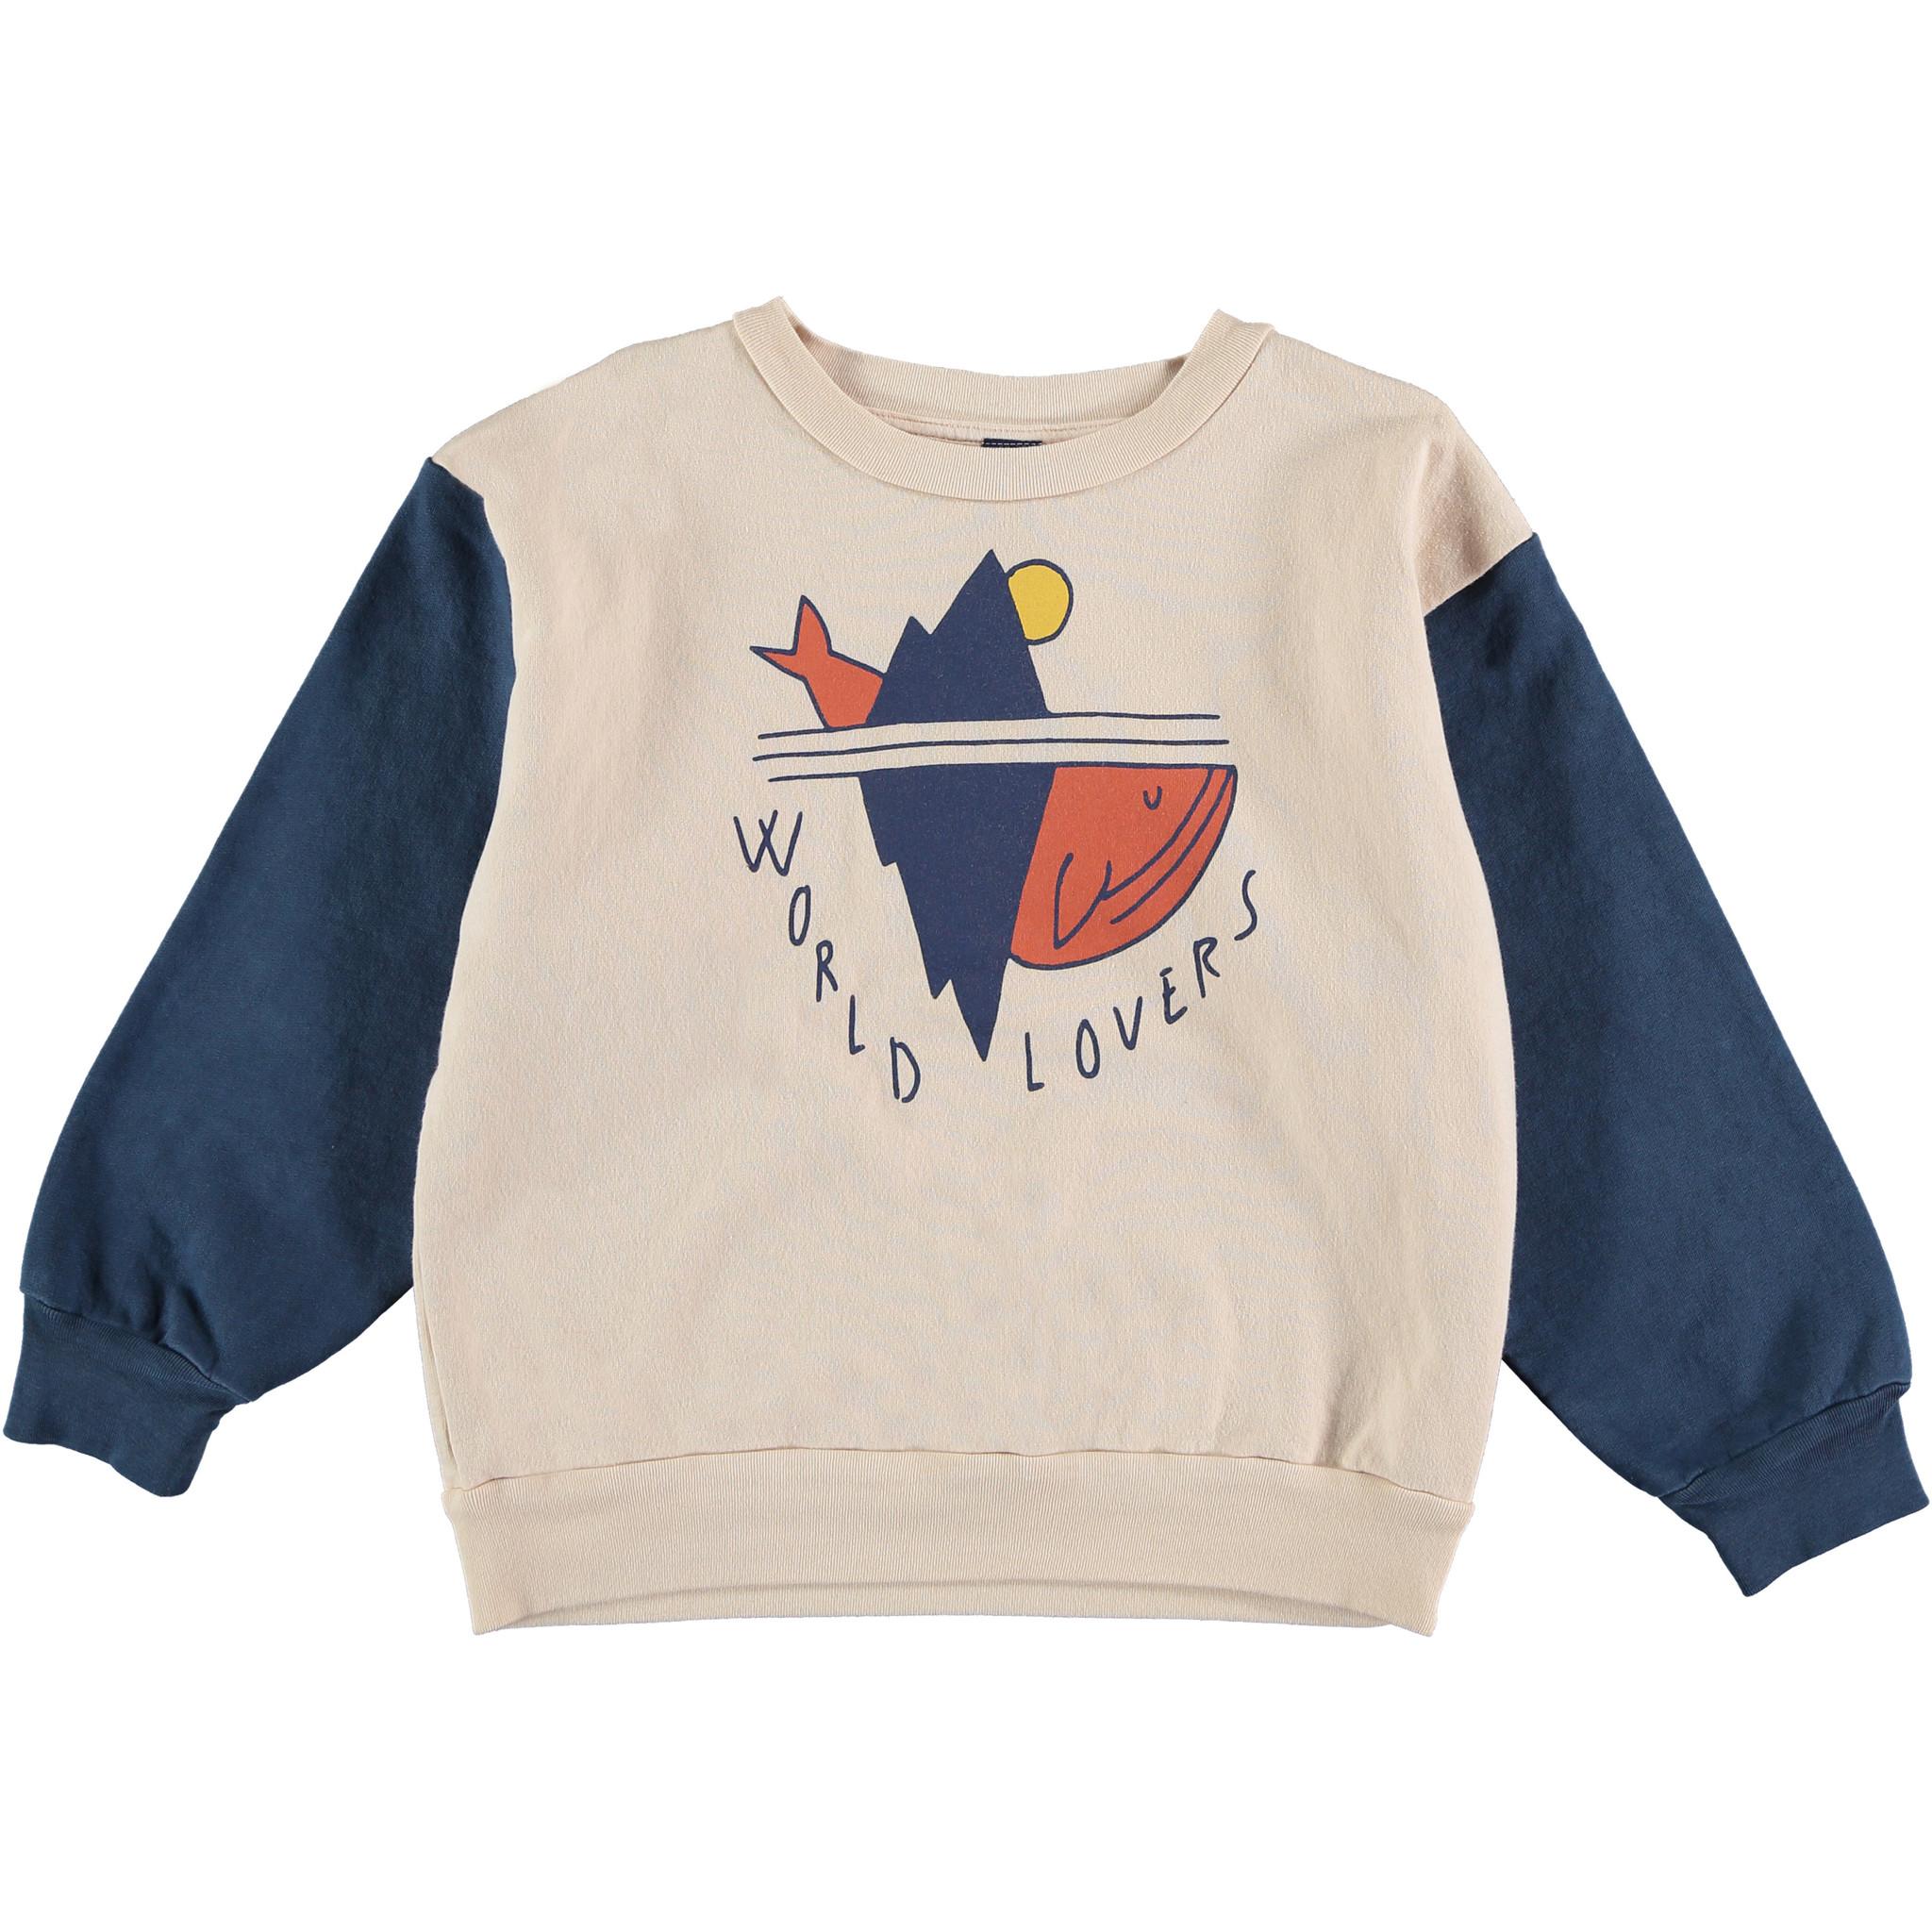 Sweatshirt world lovers navy kids-1